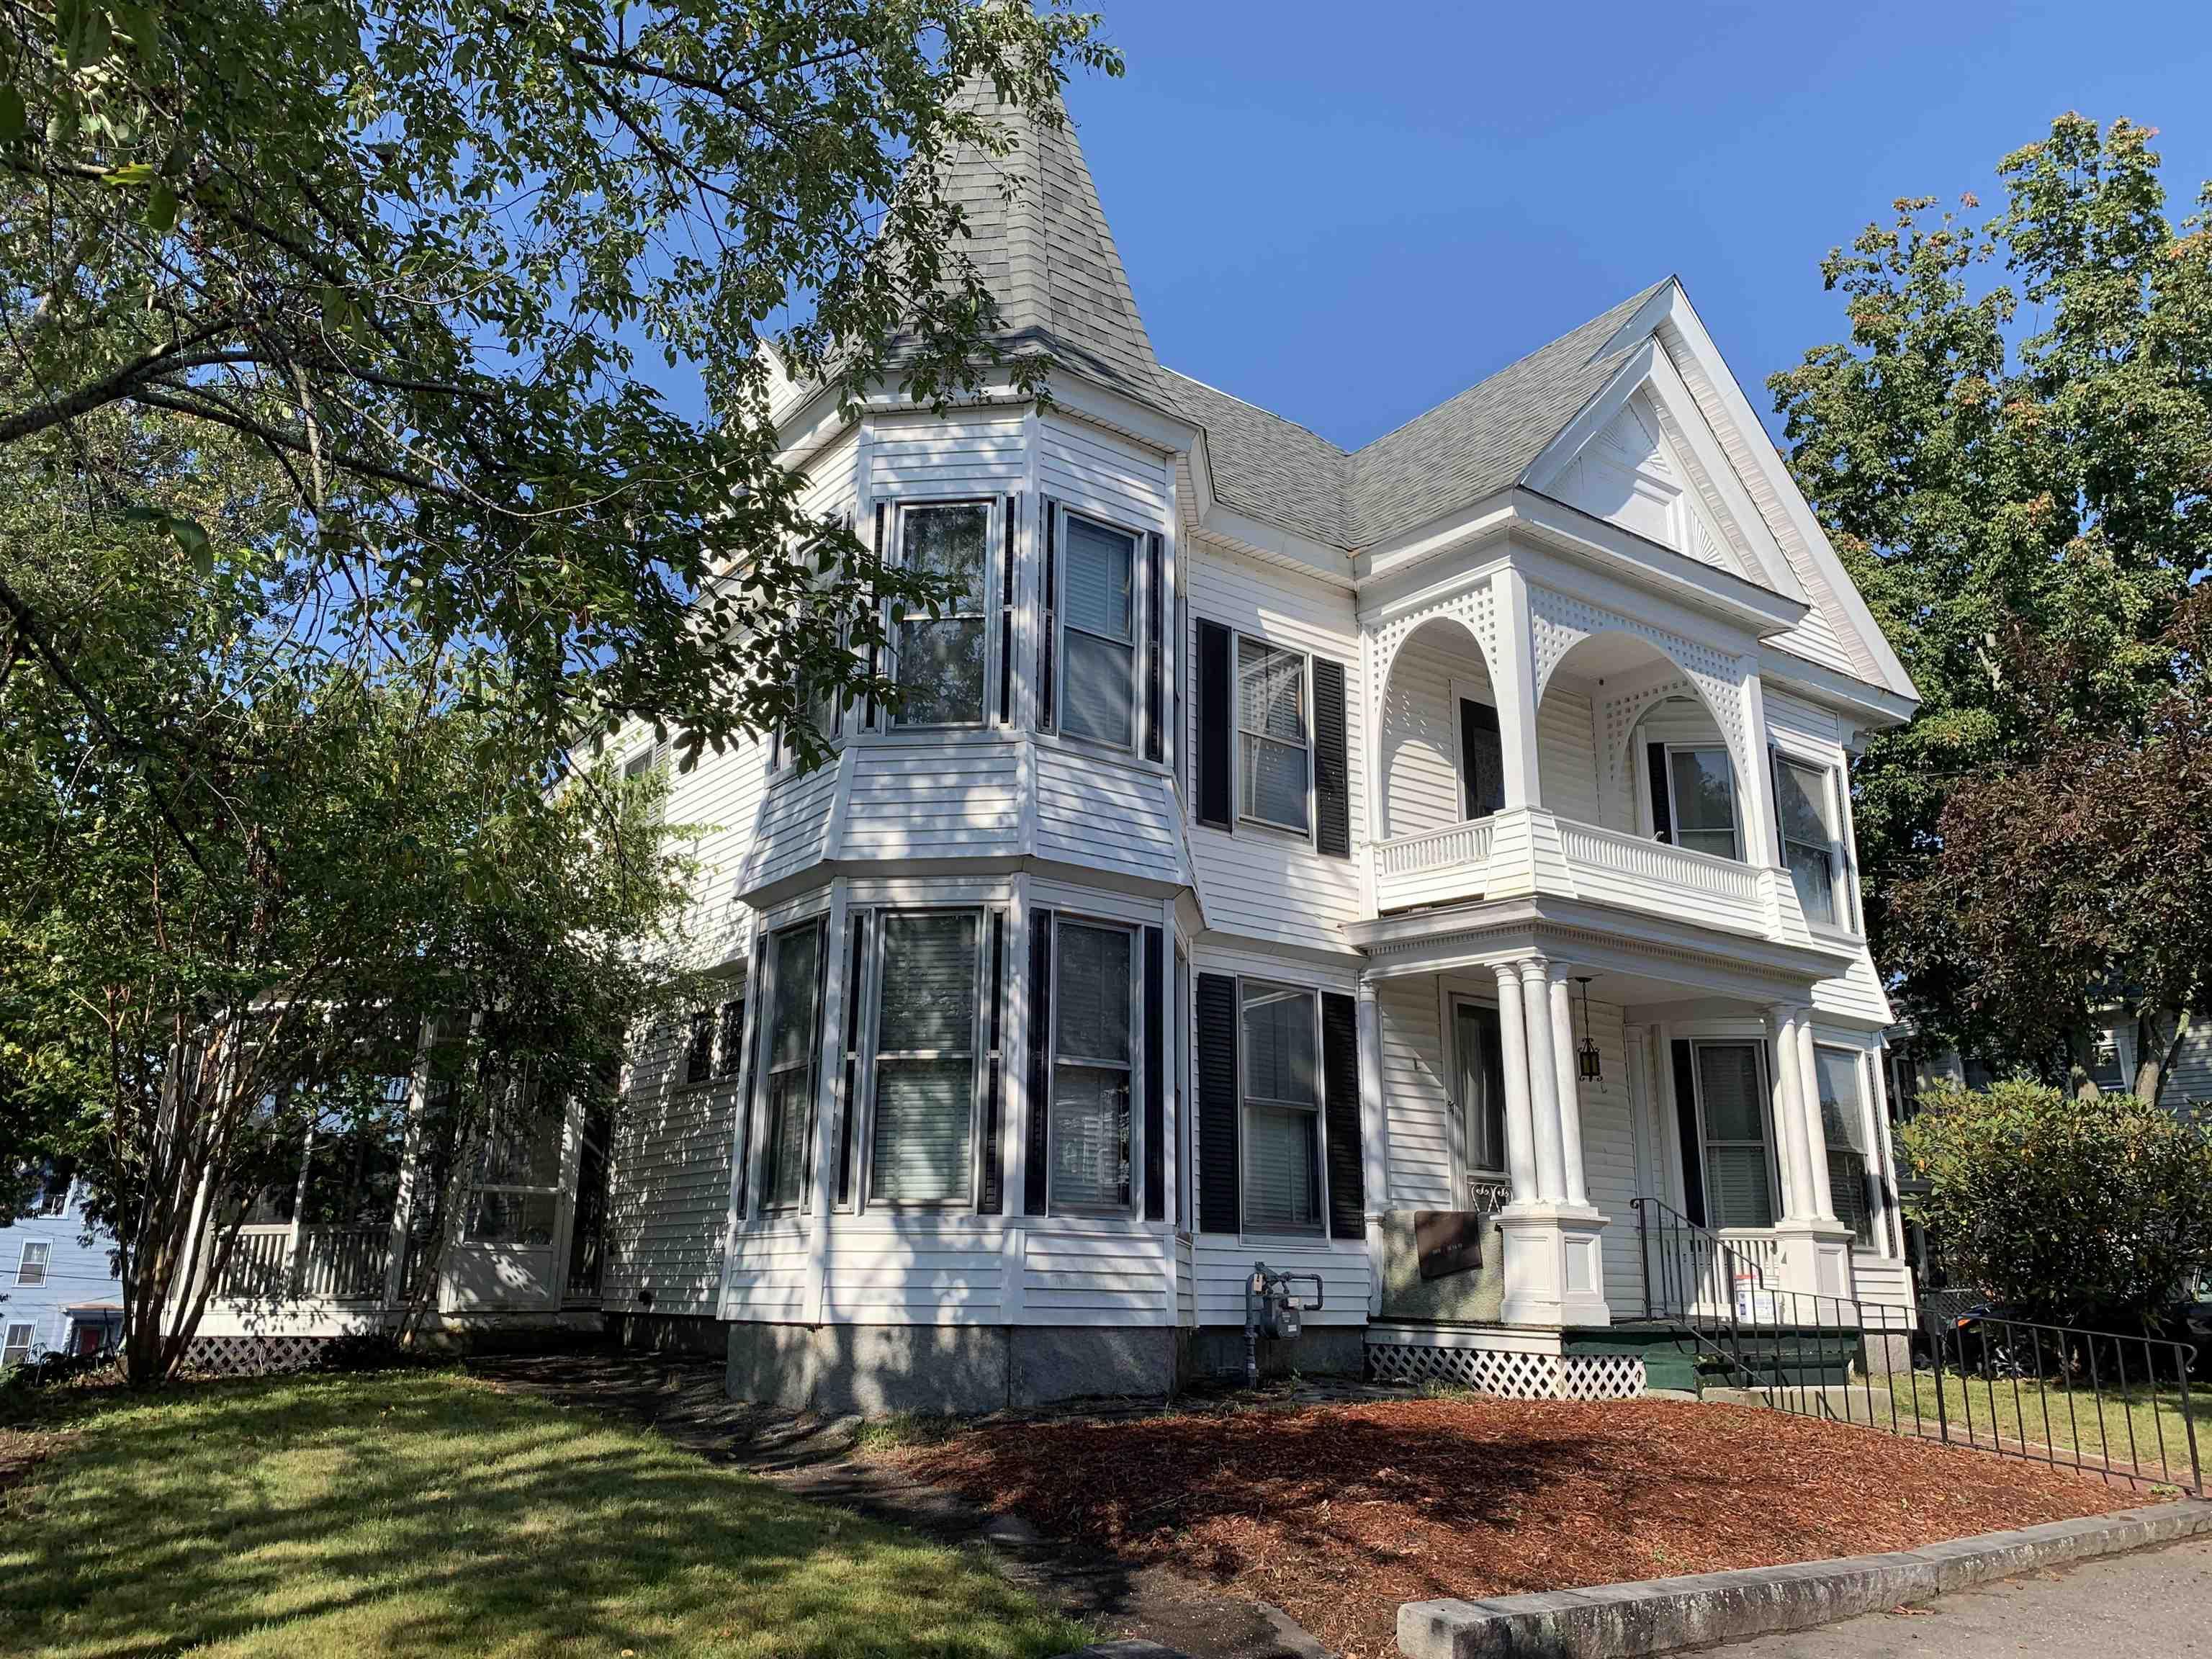 57 Rumford Street, Concord, NH 03301